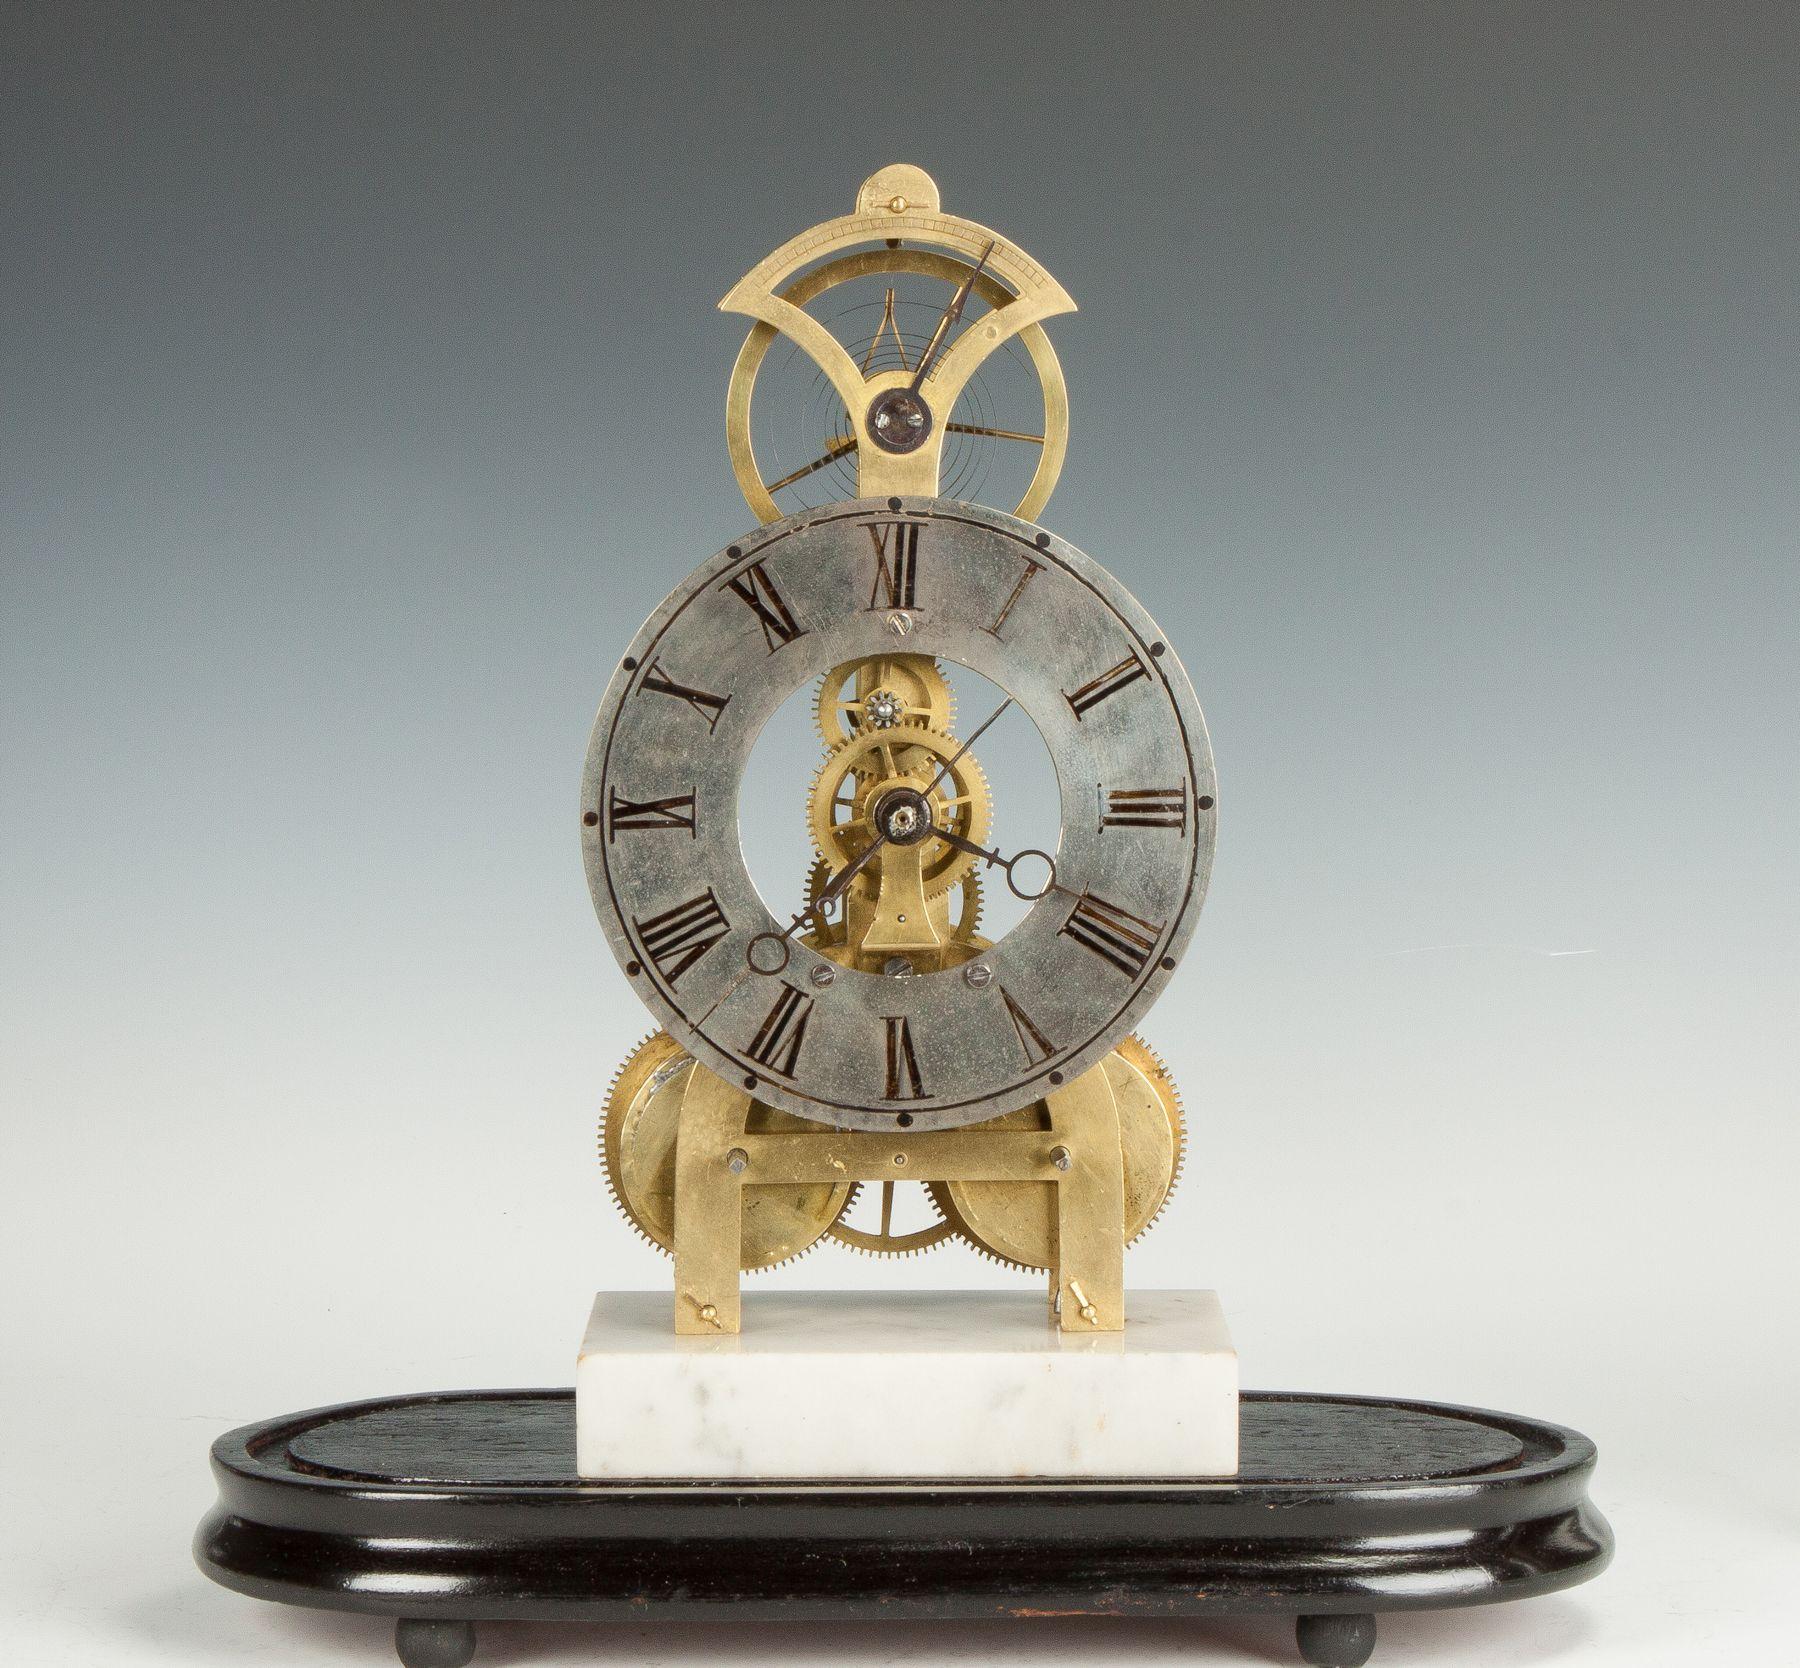 Rare S B Terry Balance Wheel Skeleton Clock Estimated At 5 000 8 000 Skeleton Clock Antique Auctions Clock